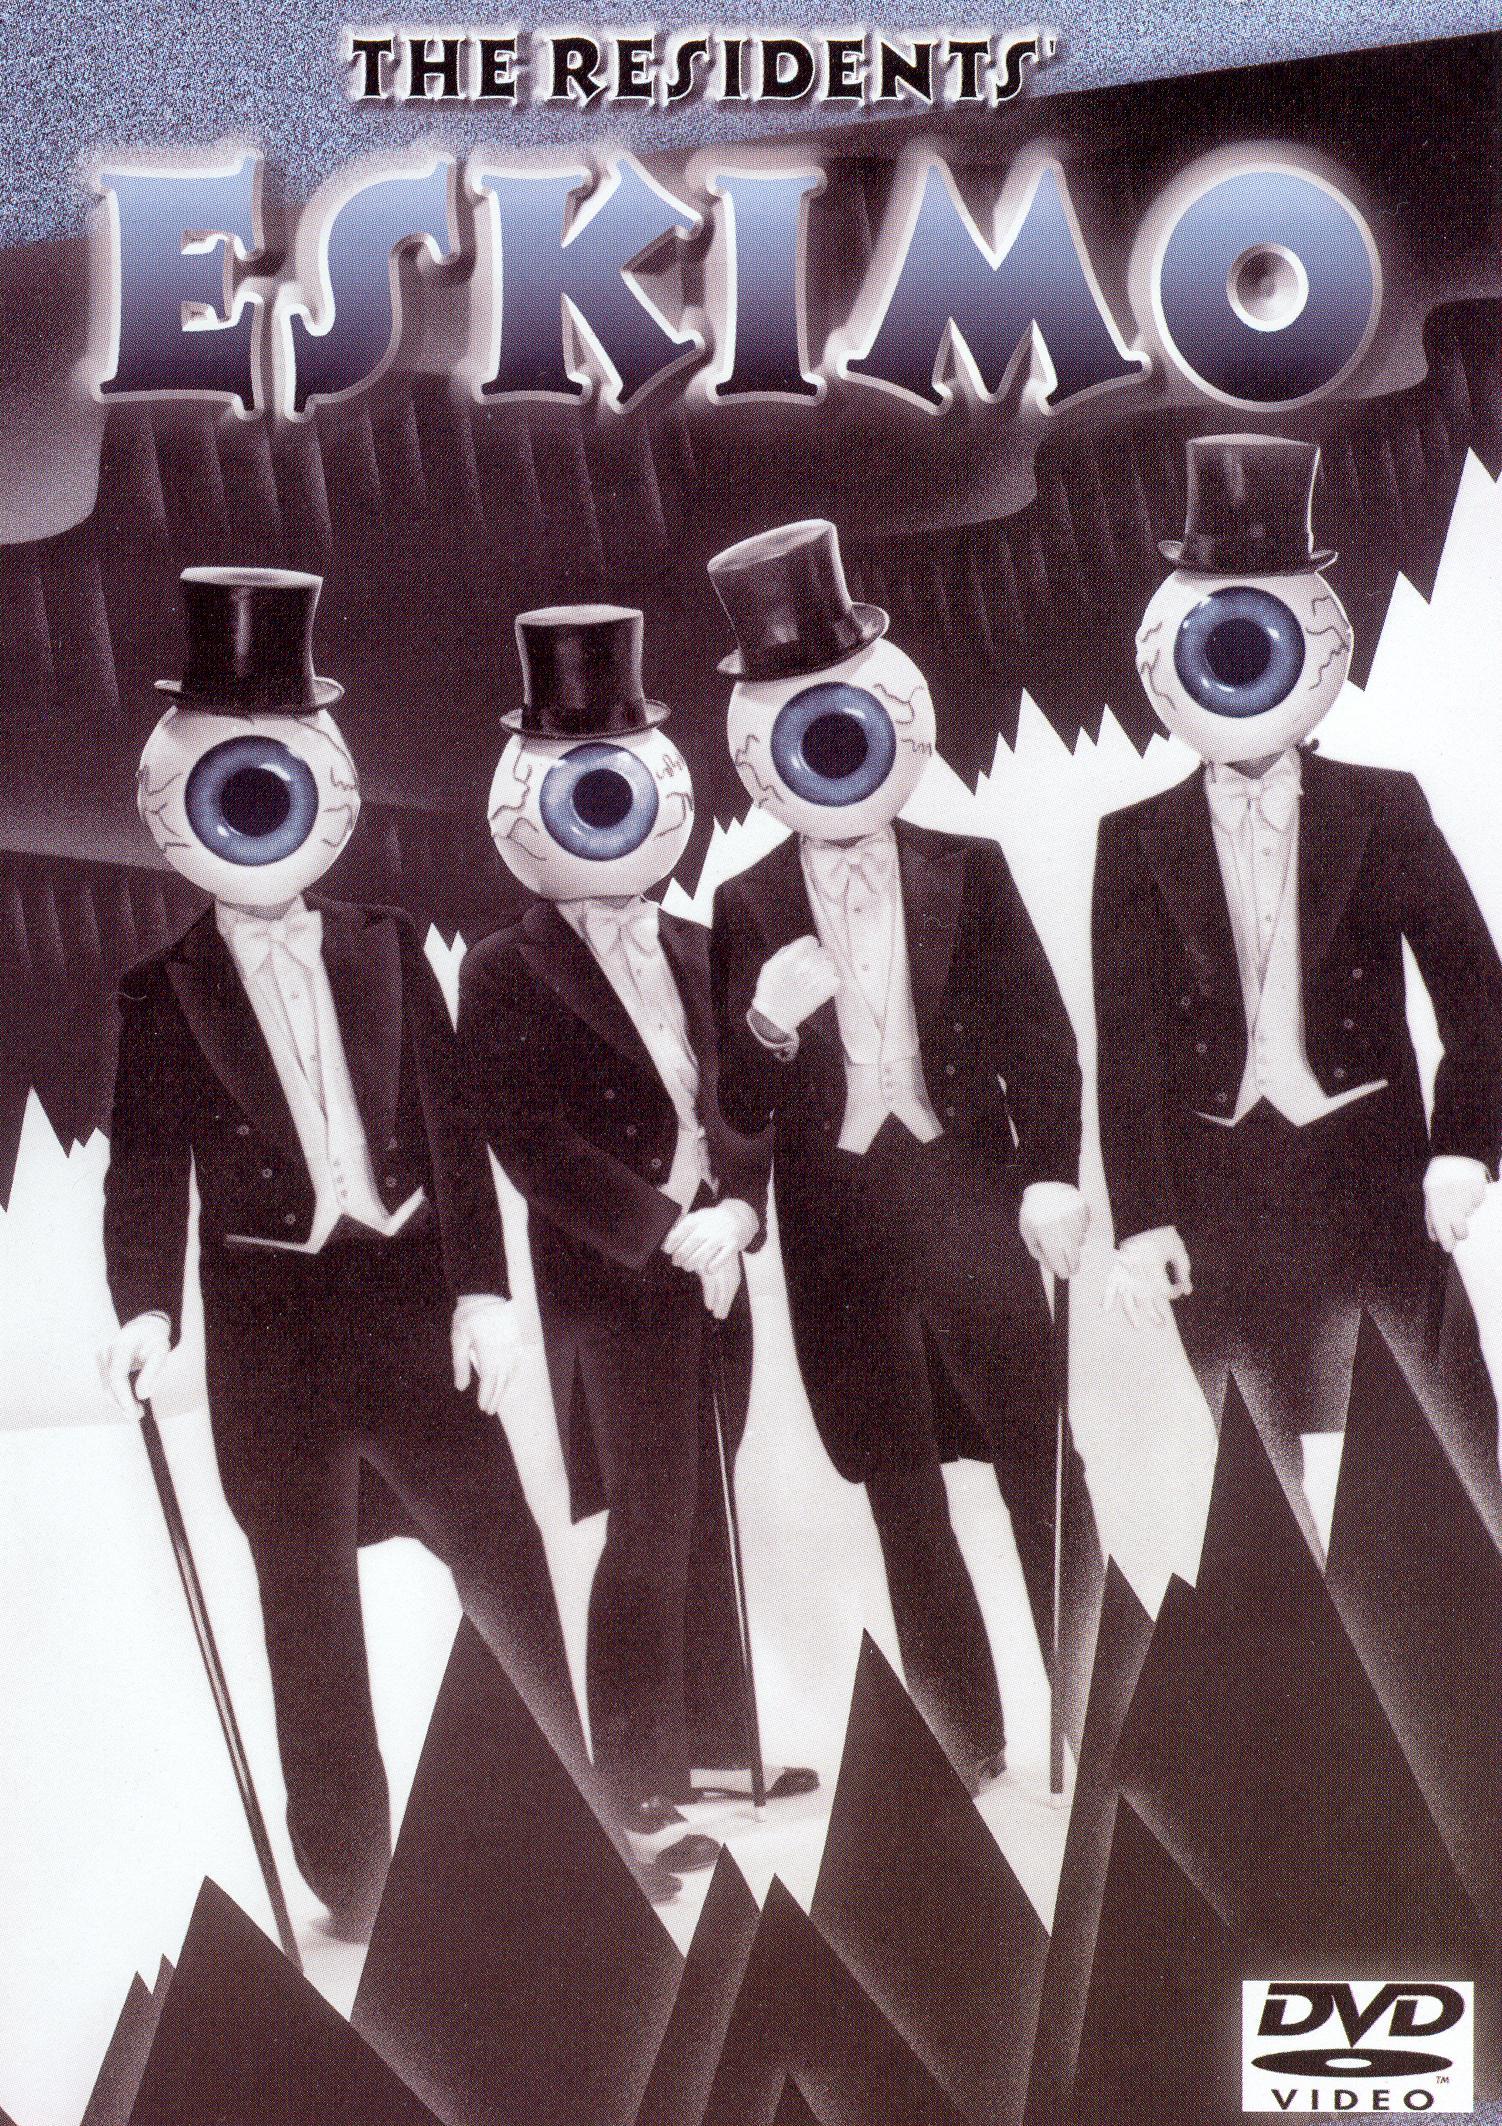 The Residents: Eskimo